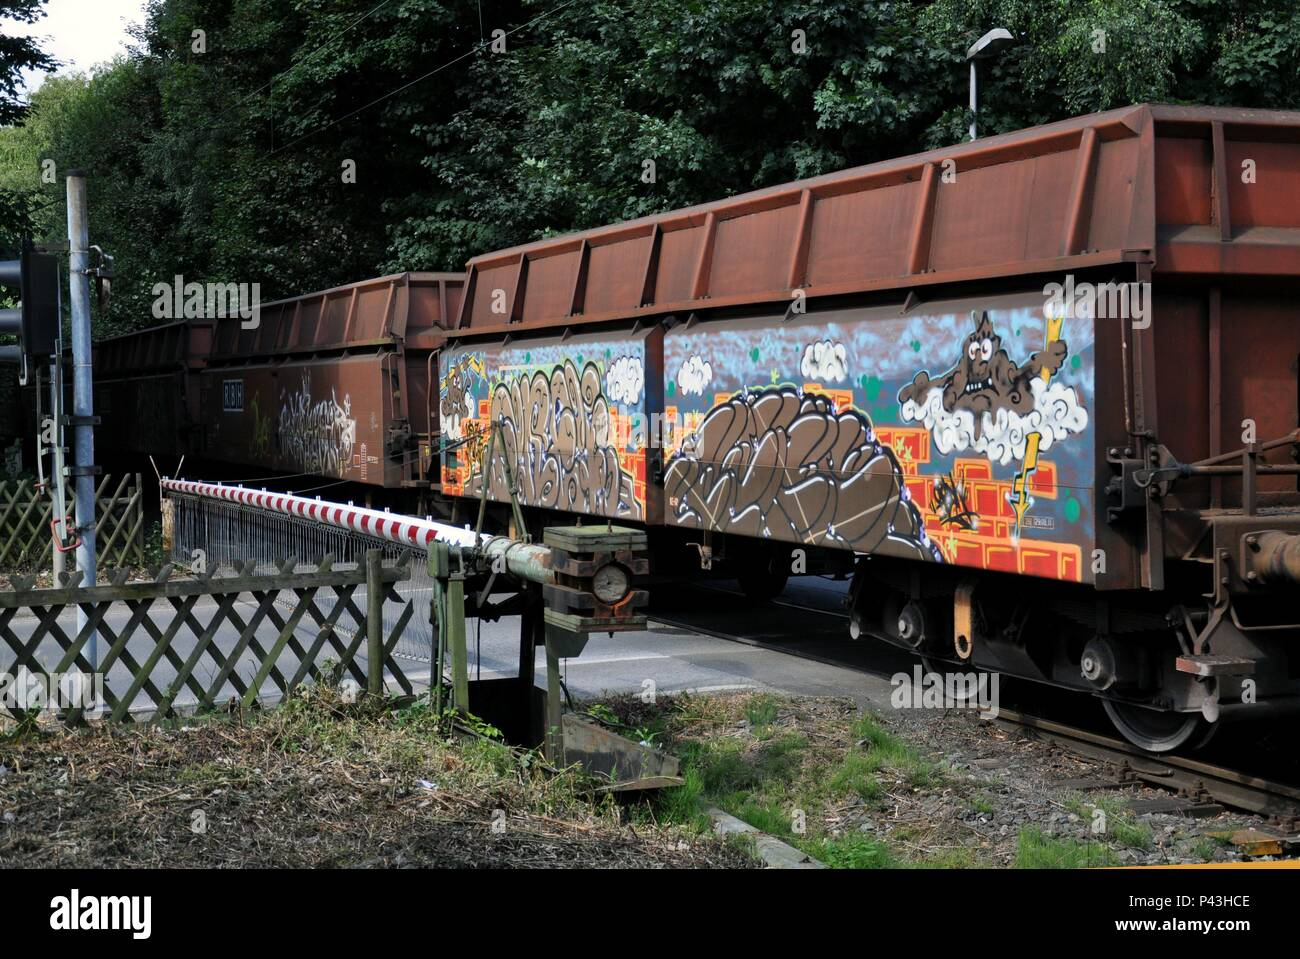 Graffiti on freight train on 10.08.2012 in Gelsenkirchen - Germany. | usage worldwide - Stock Image